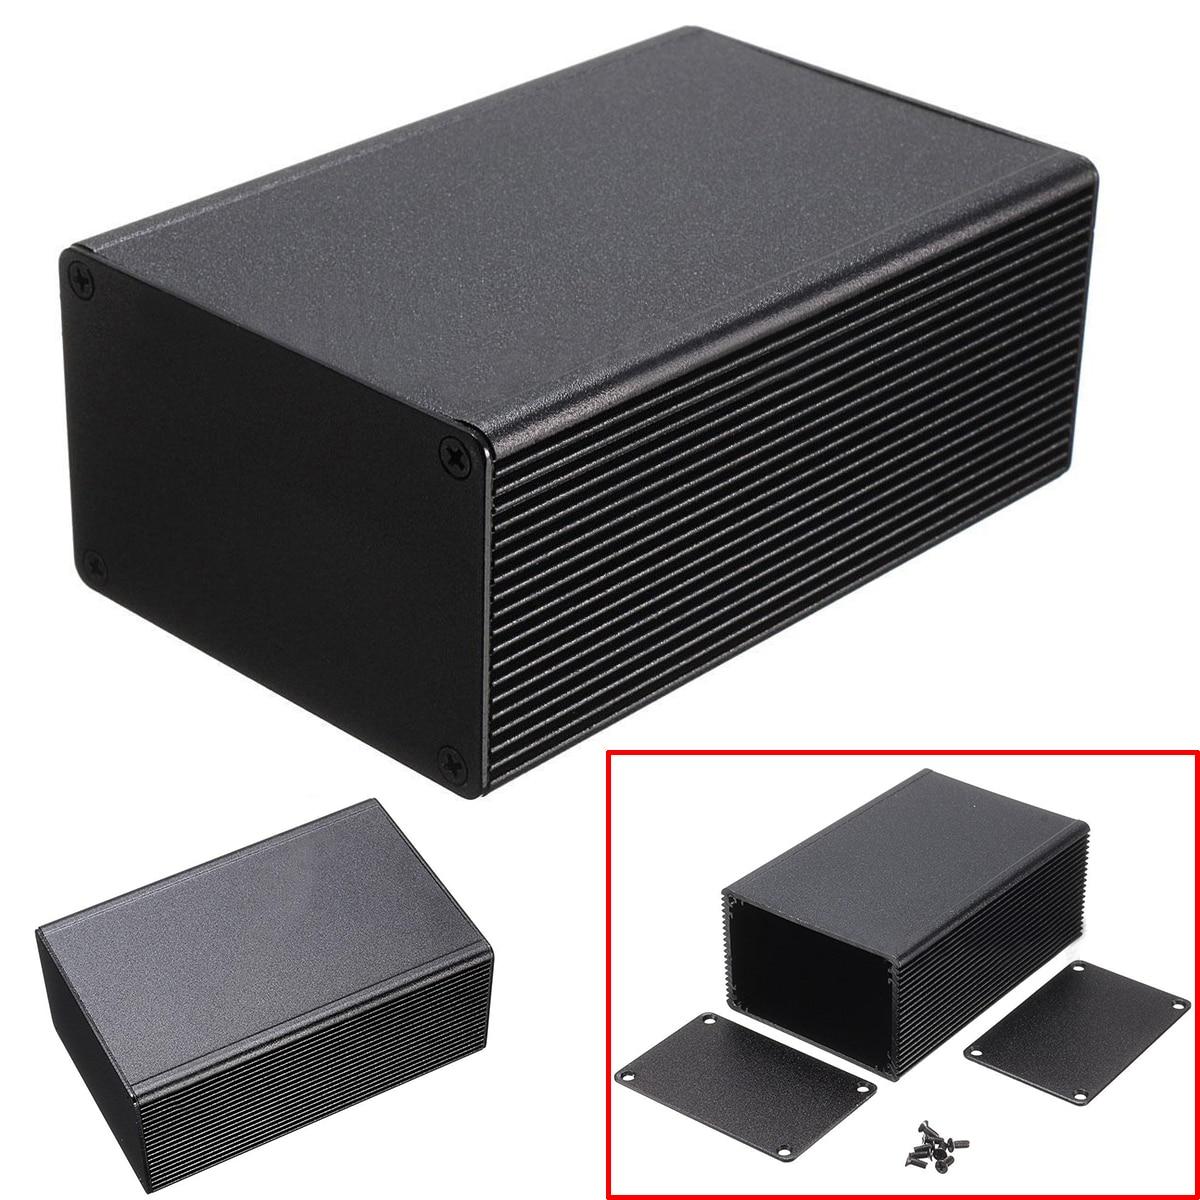 1Pcs Aluminum Electronic Box Black PCB Instrument Meter Enclosure Case 100x66x43mm